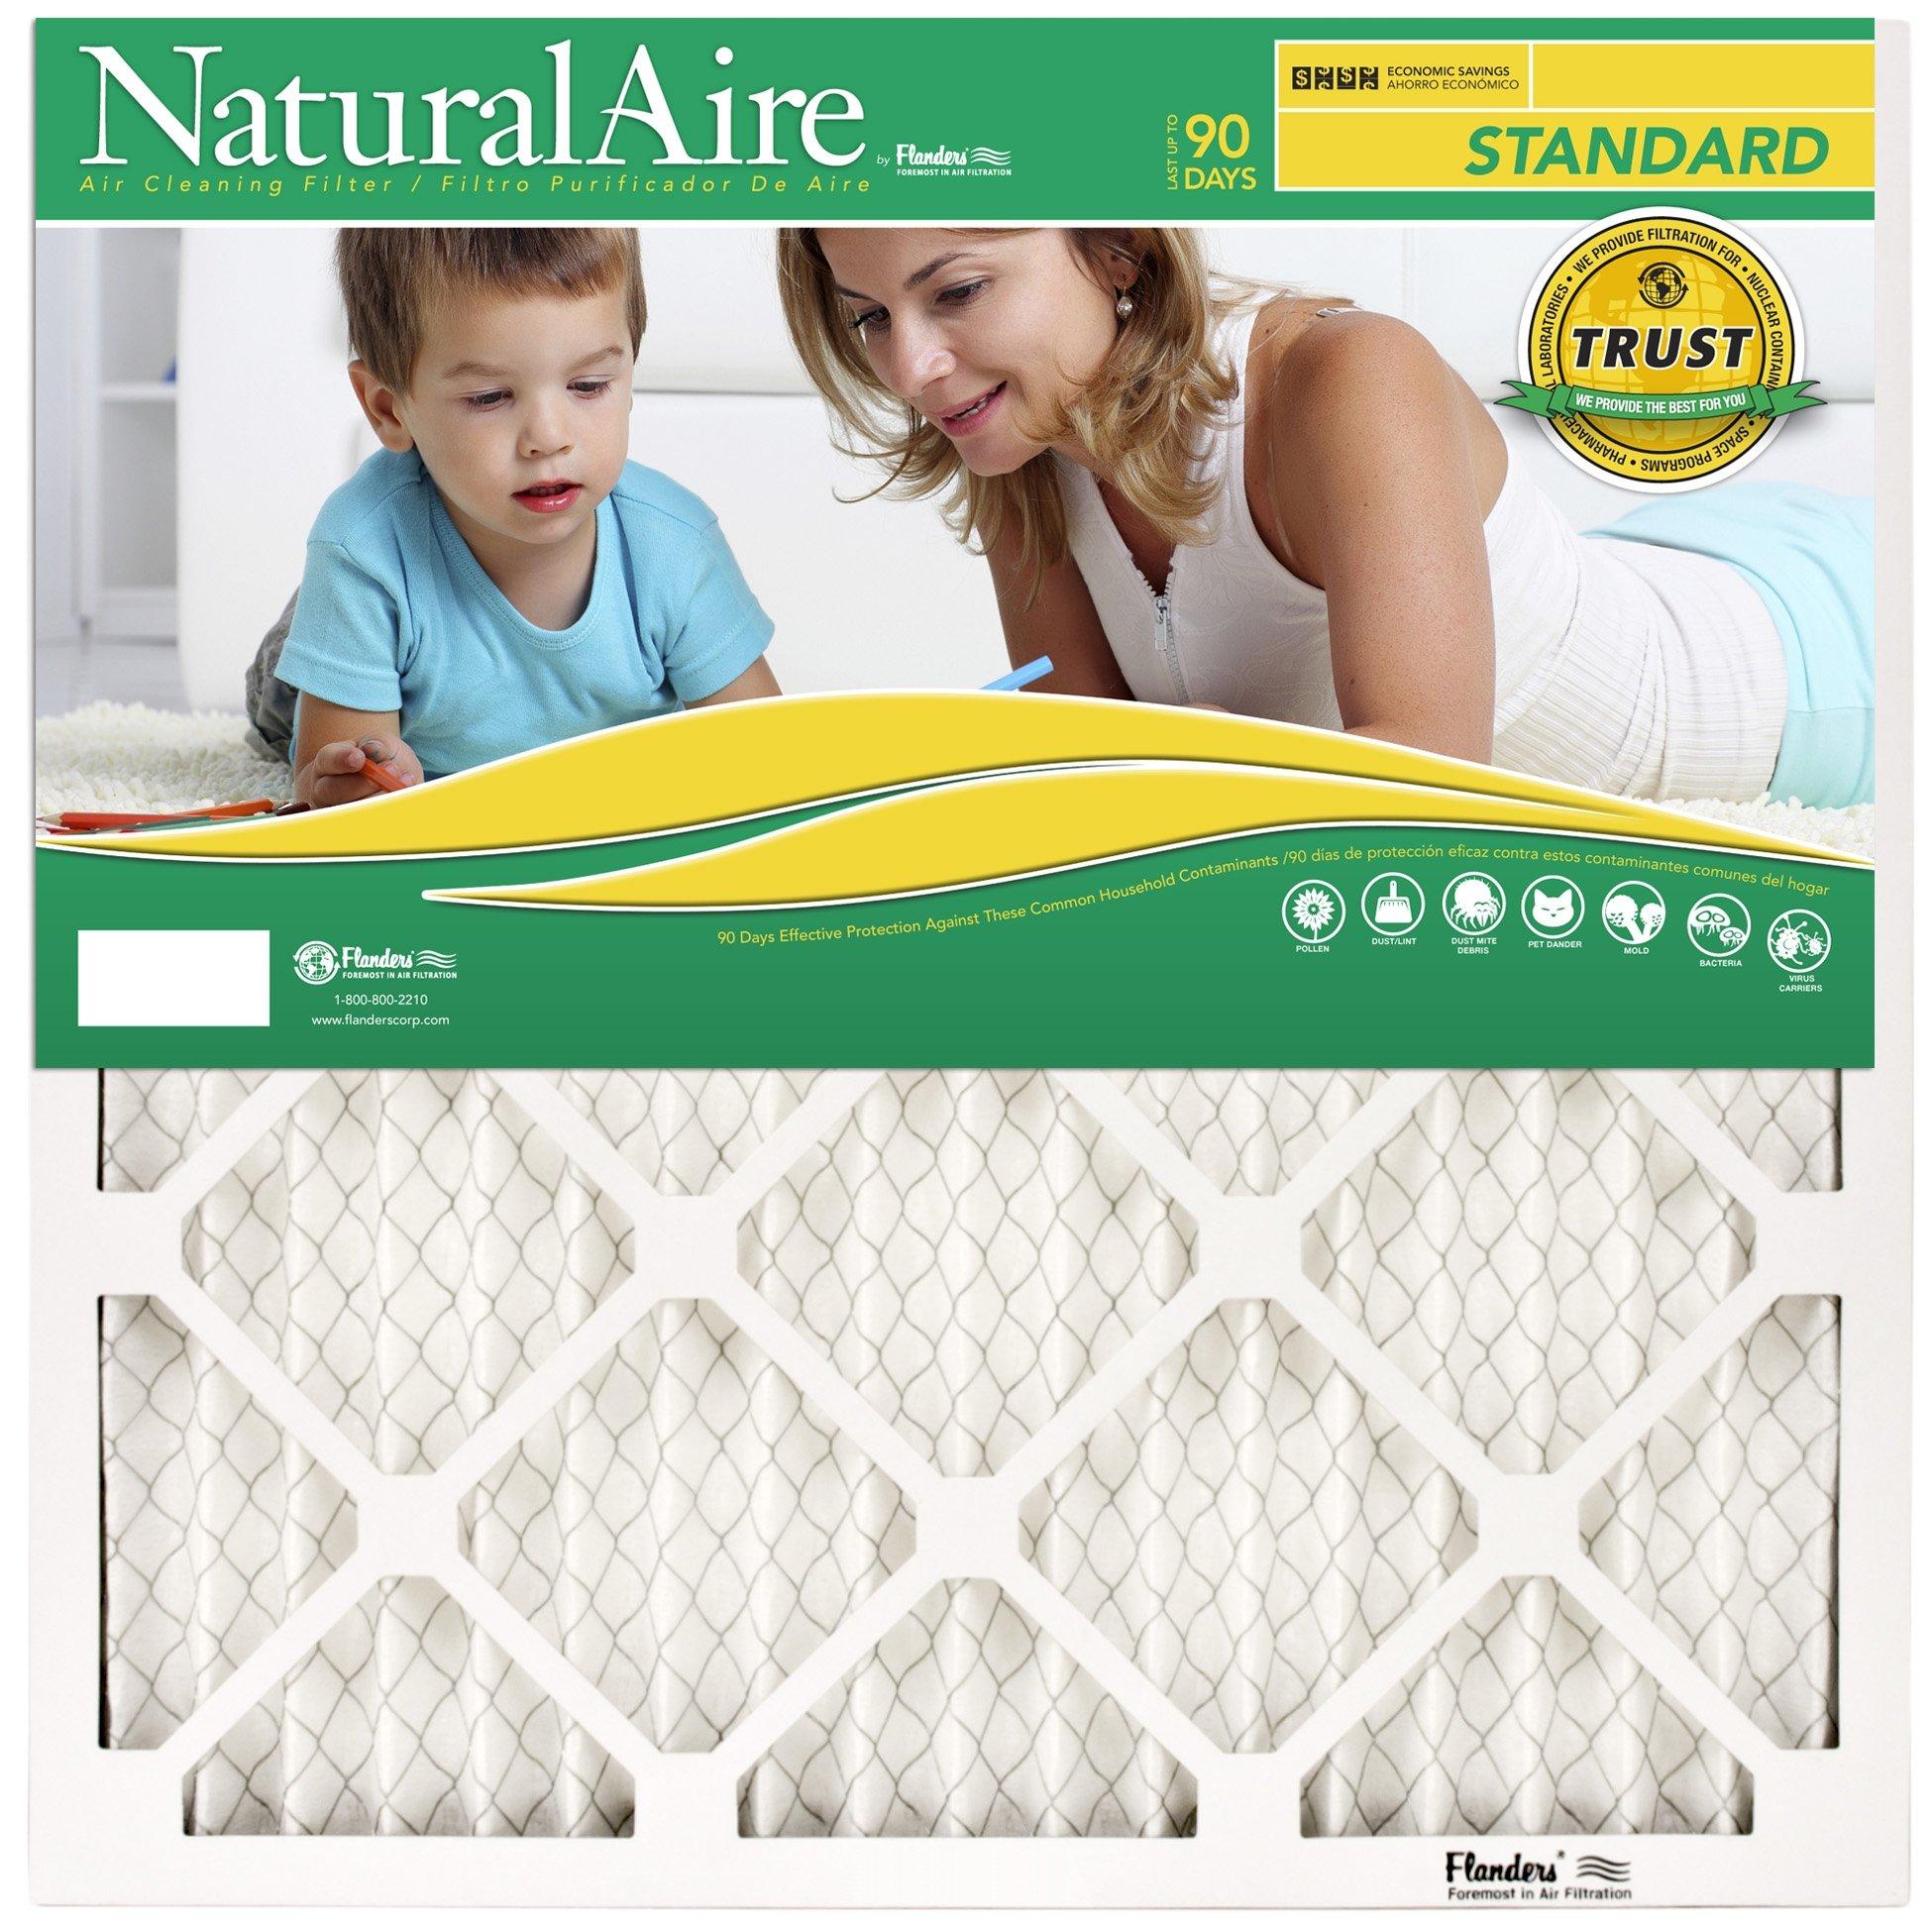 NaturalAire Standard Air Filter, MERV 8, 20 x 30, 1-inch, 12-Pack